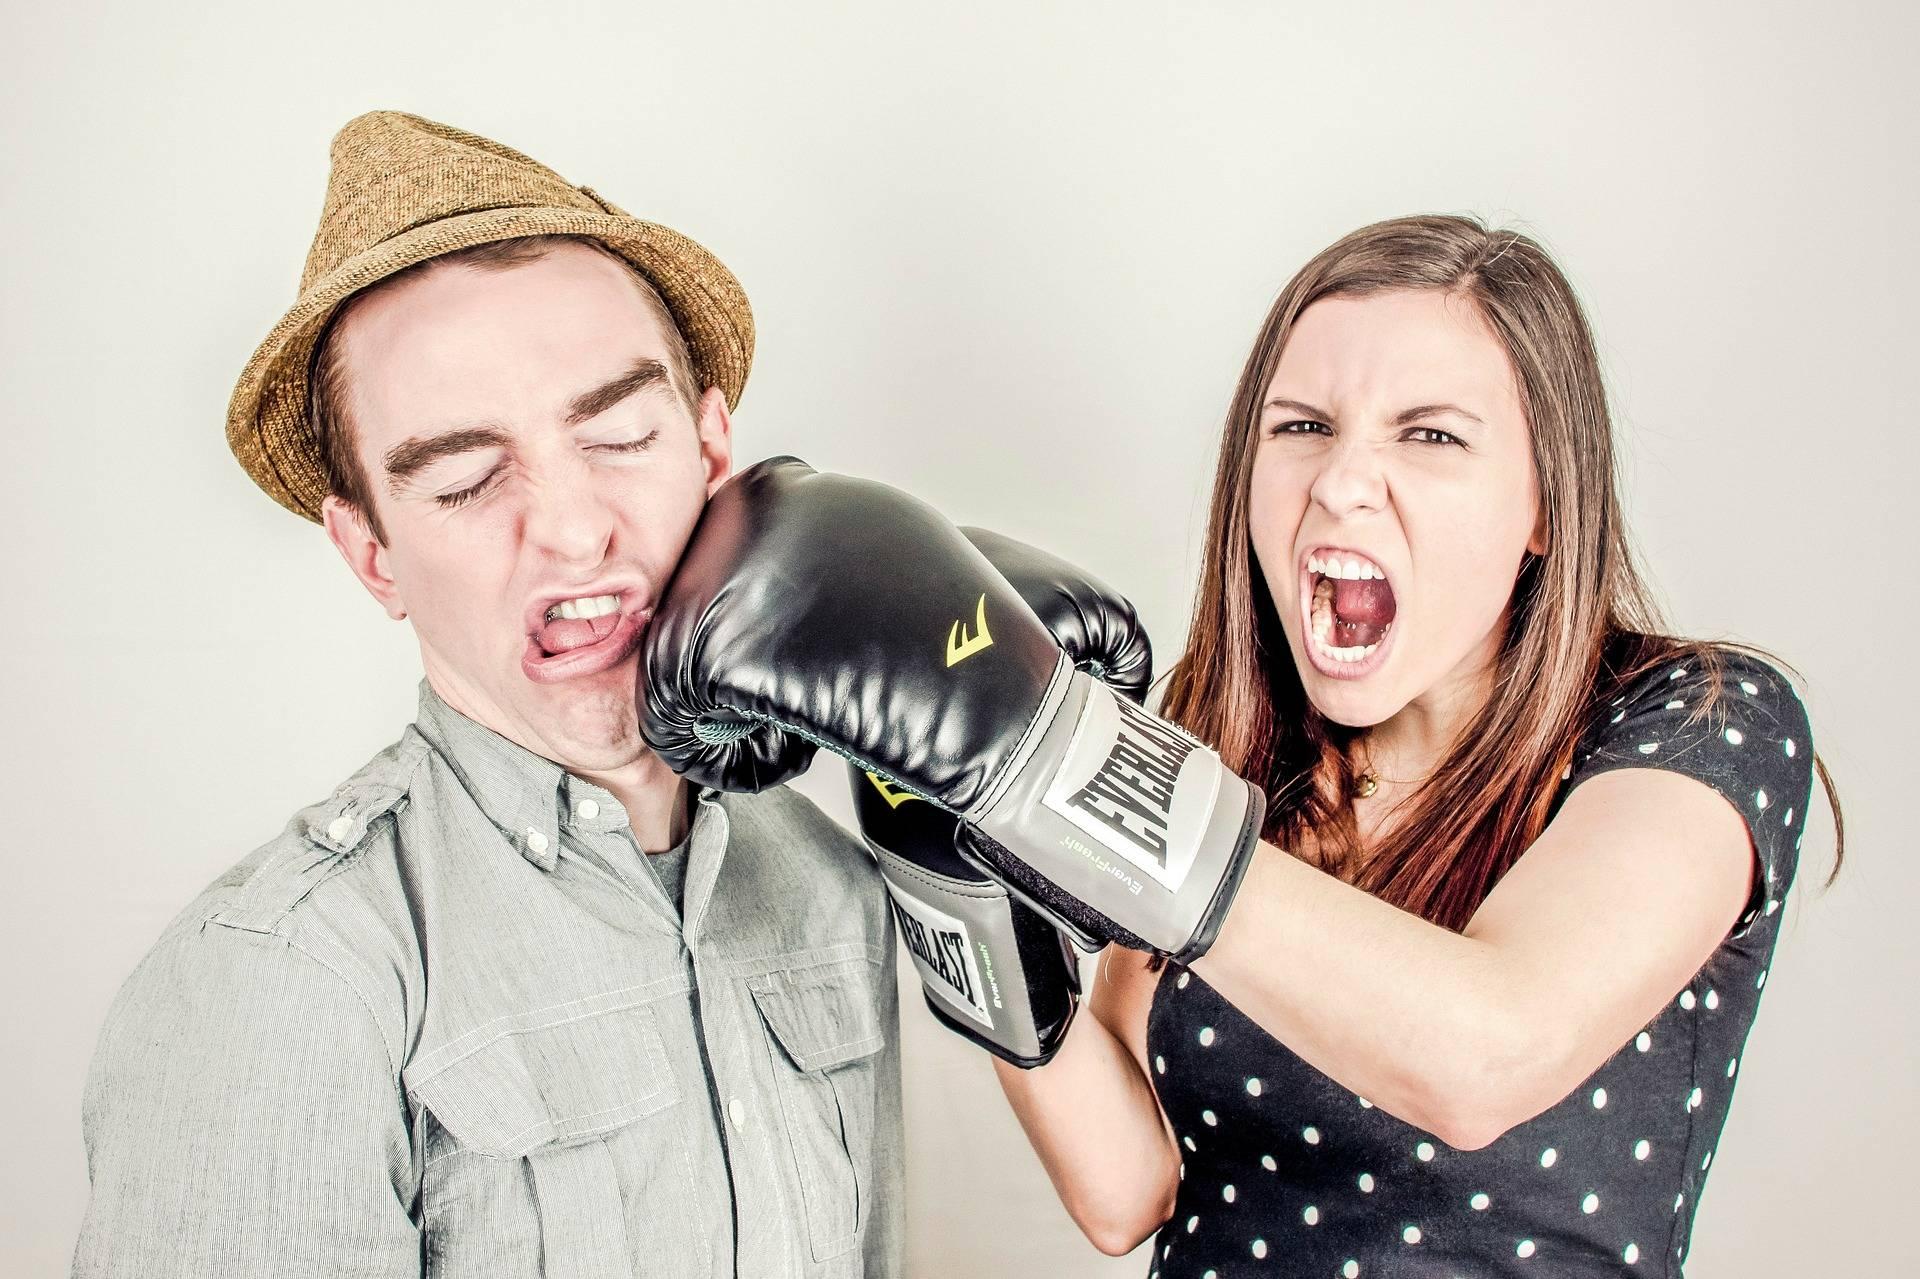 Passive-Aggressive Traits in Females